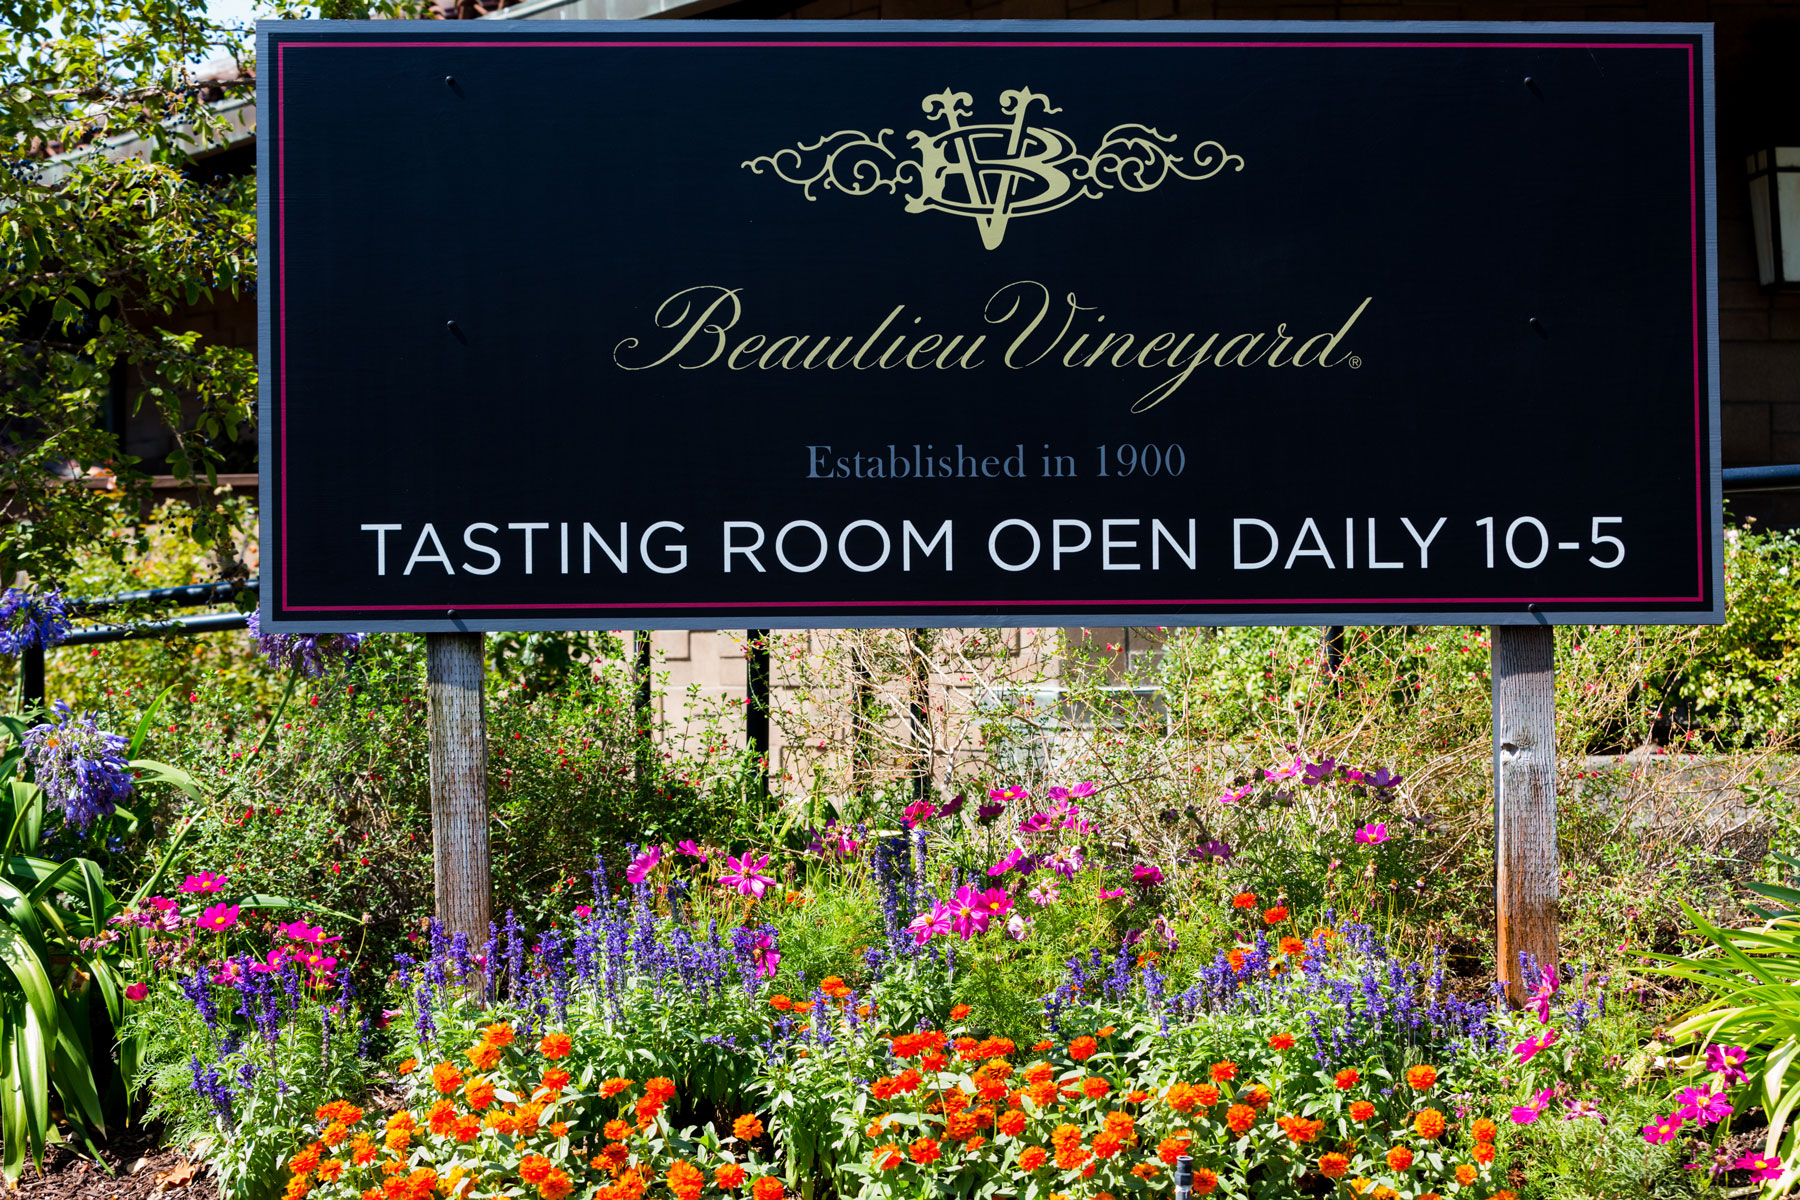 Beaulieu-Vineyard-Napa-corporate-photography-4-wine